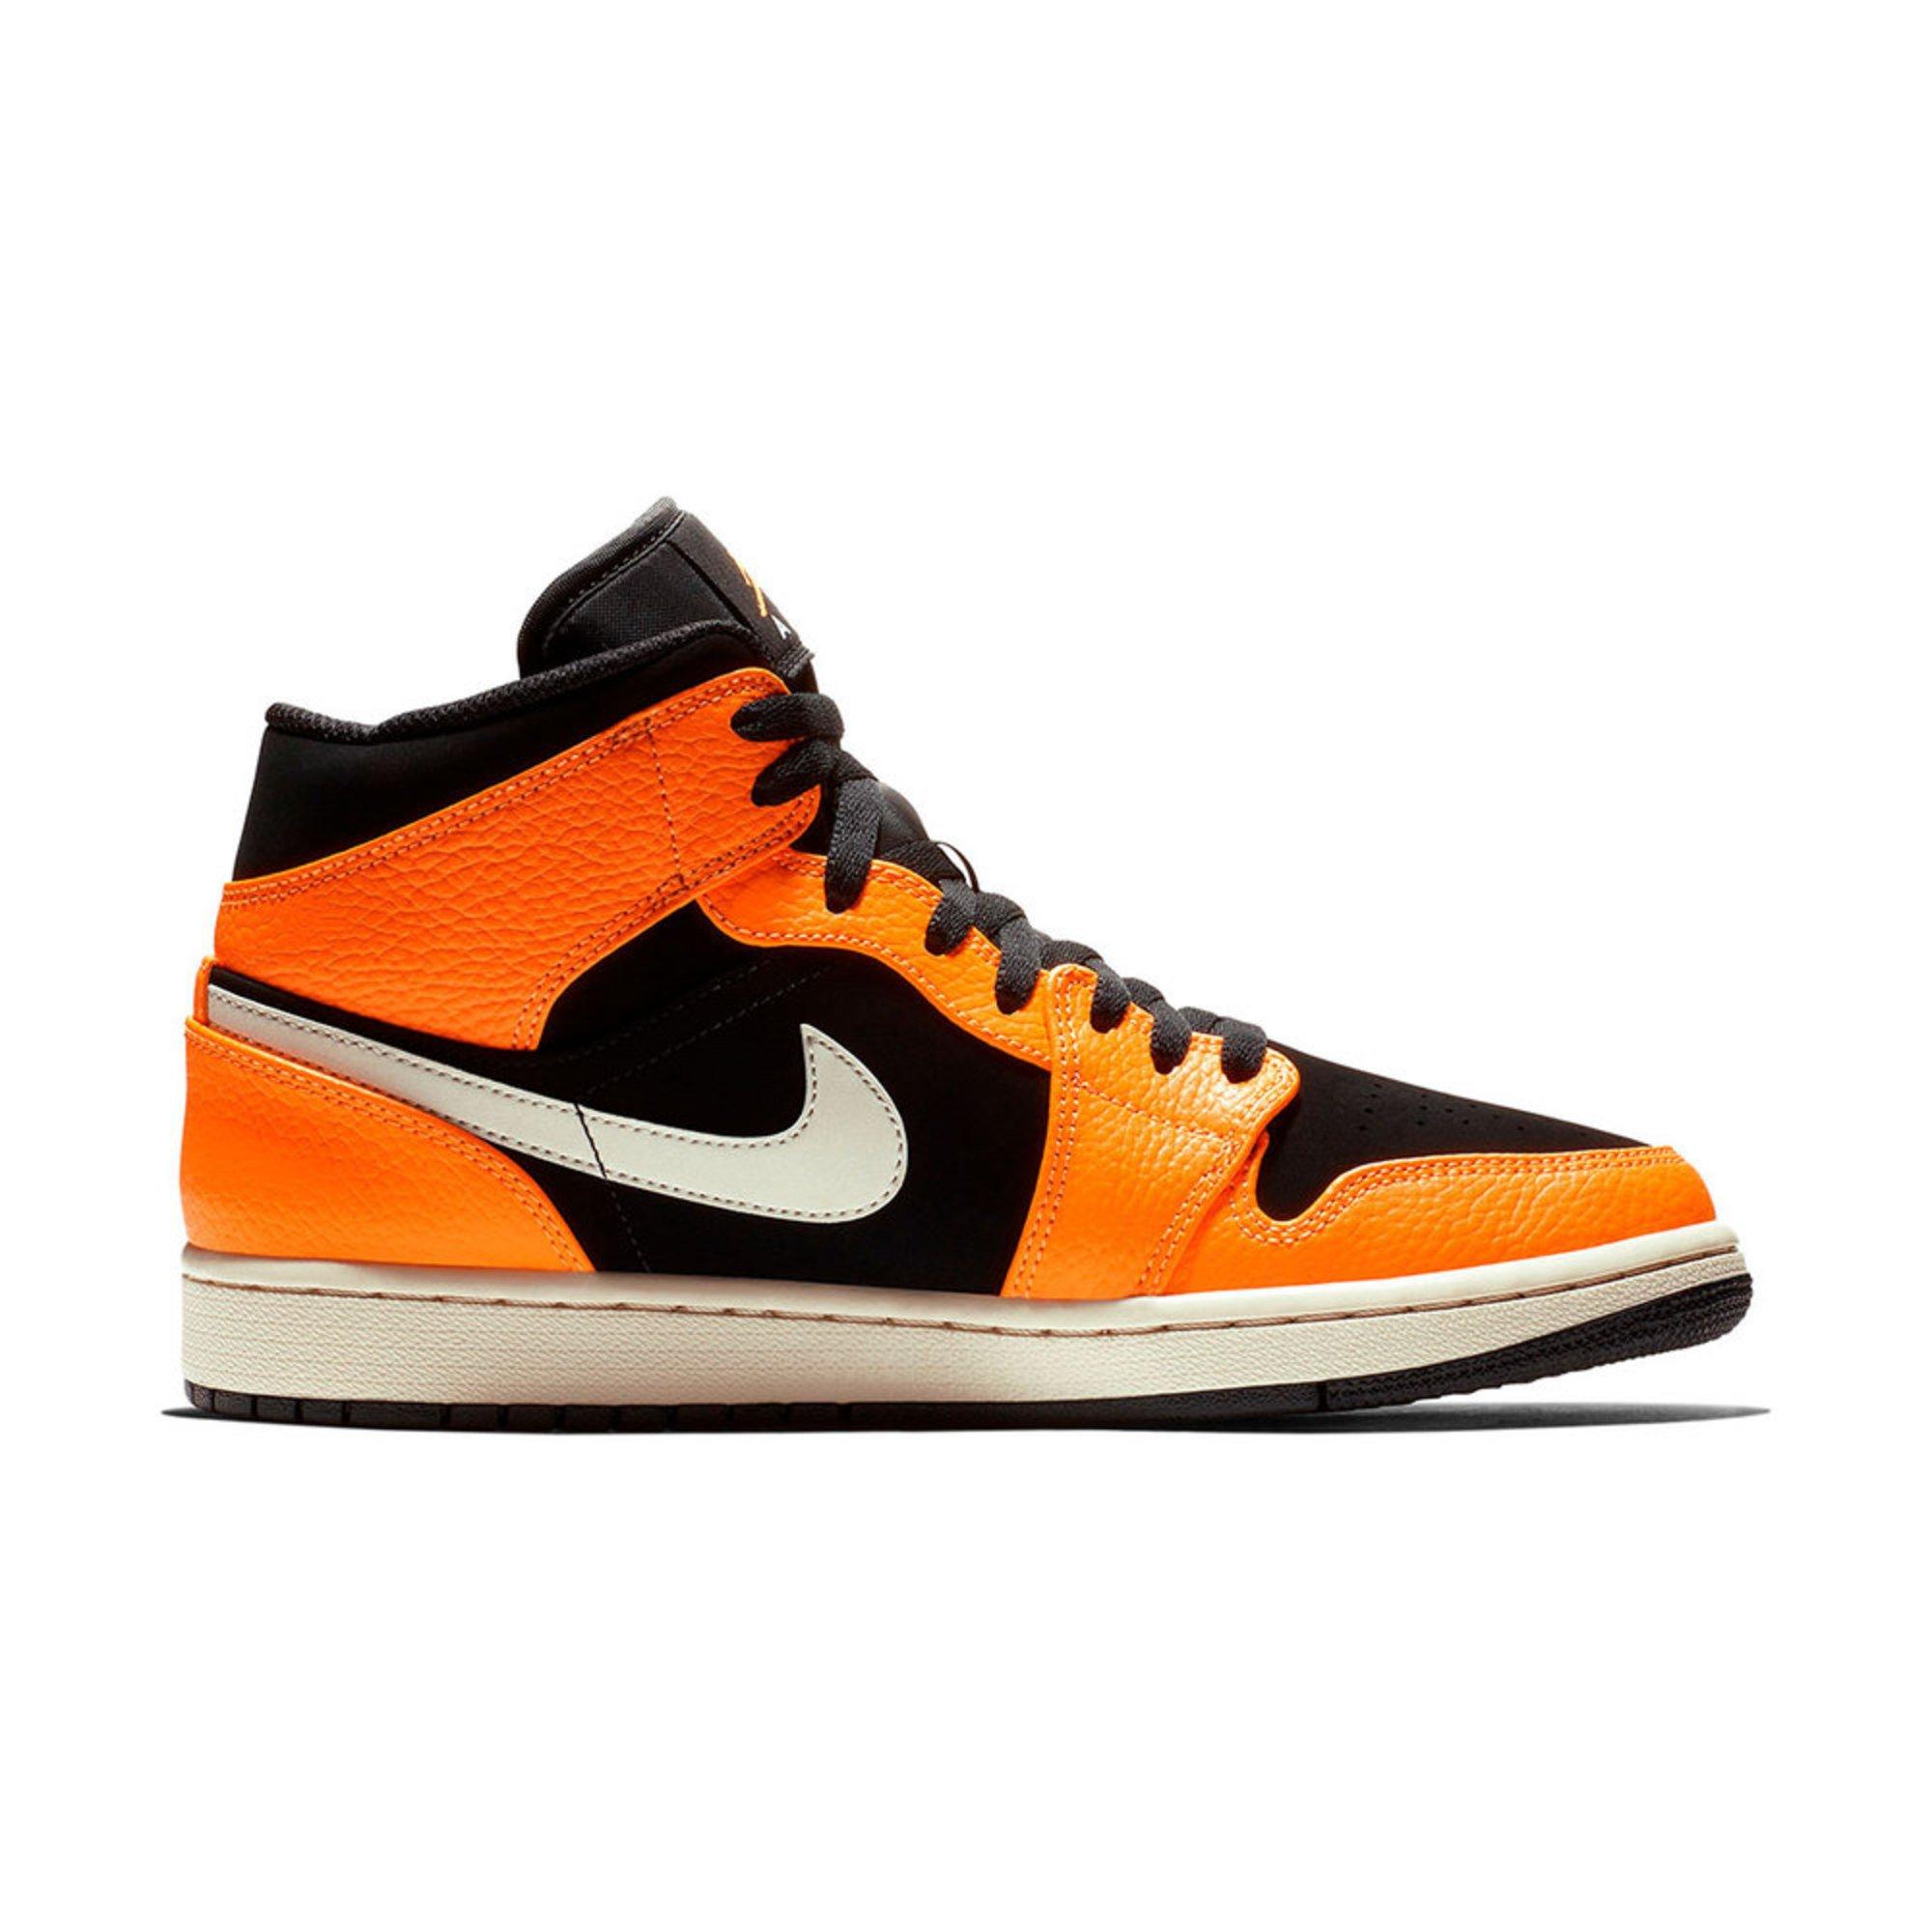 8de113129eb2 Jordan. Jordan Men s Air Jordan 1 Mid Basketball Shoe